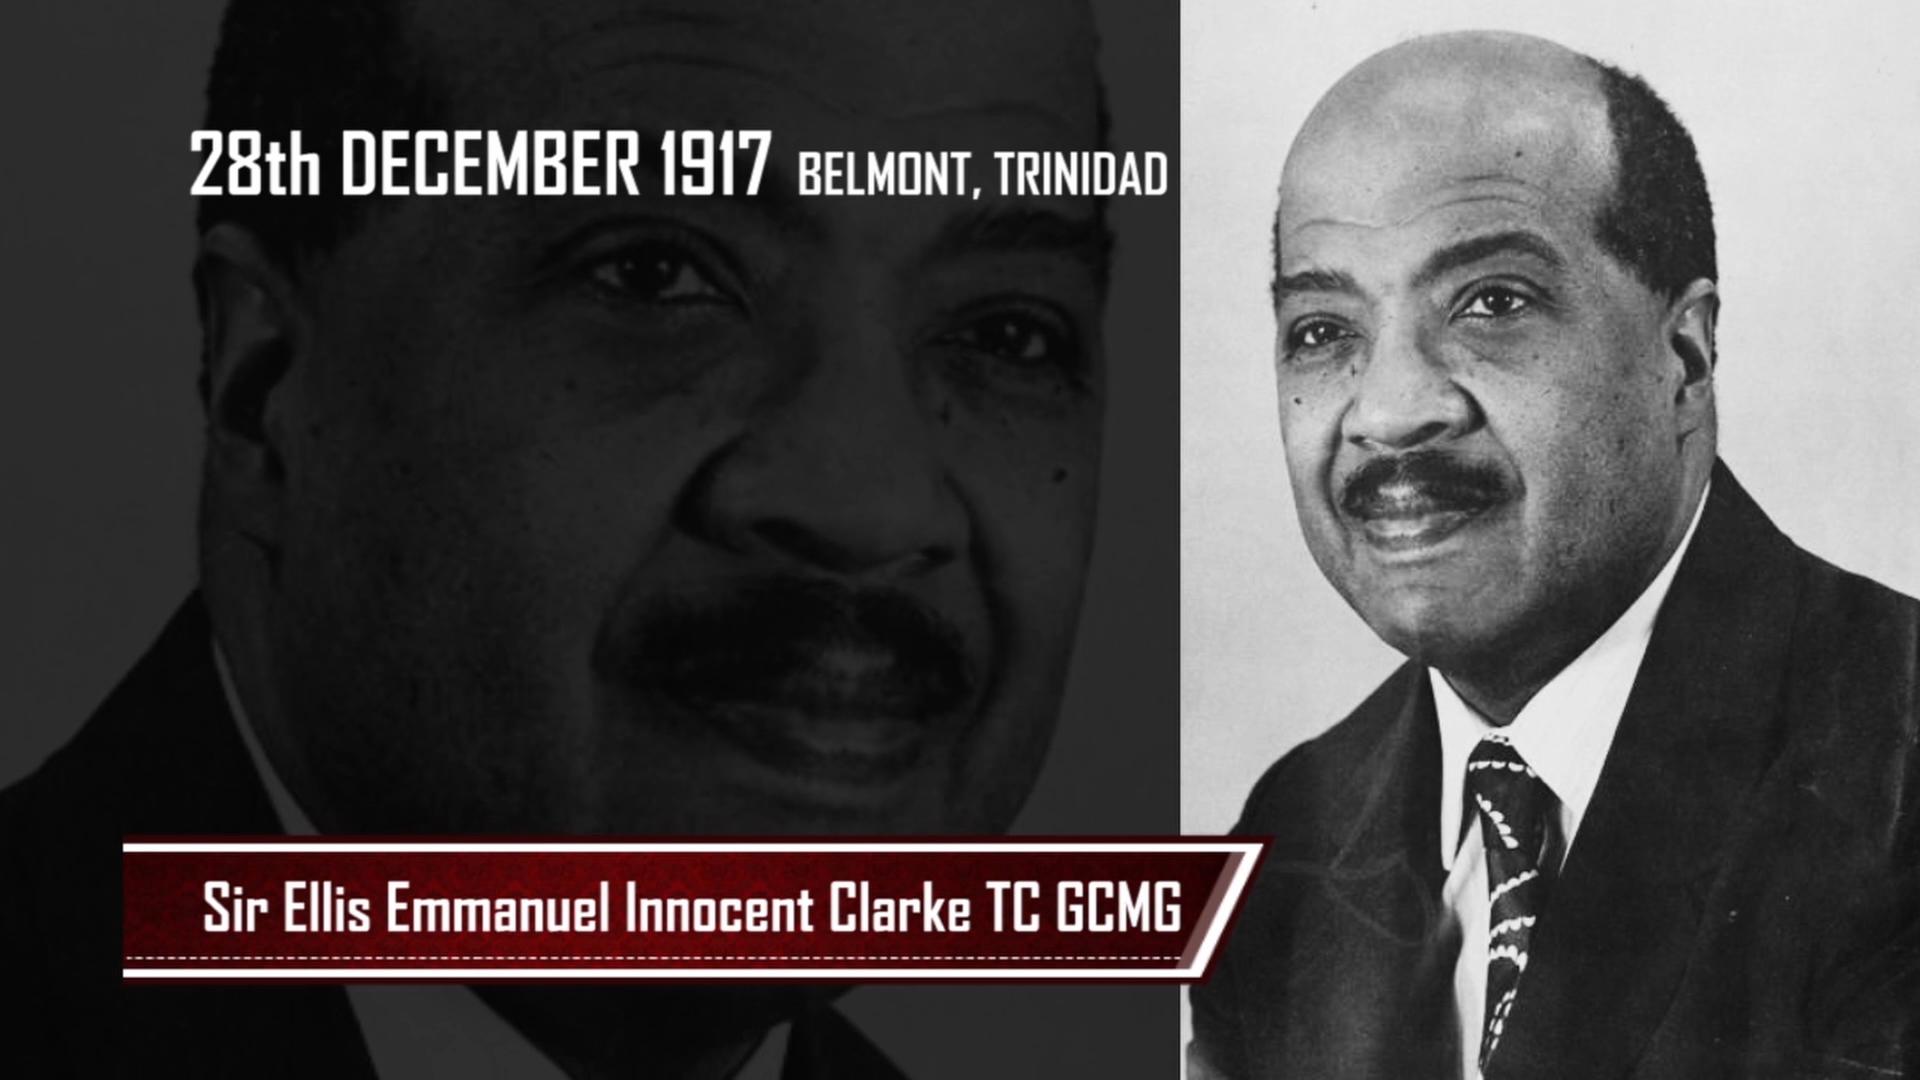 PRESIDENTS OF THE PAST- Sir Ellis Emmanuel Innocent Clark